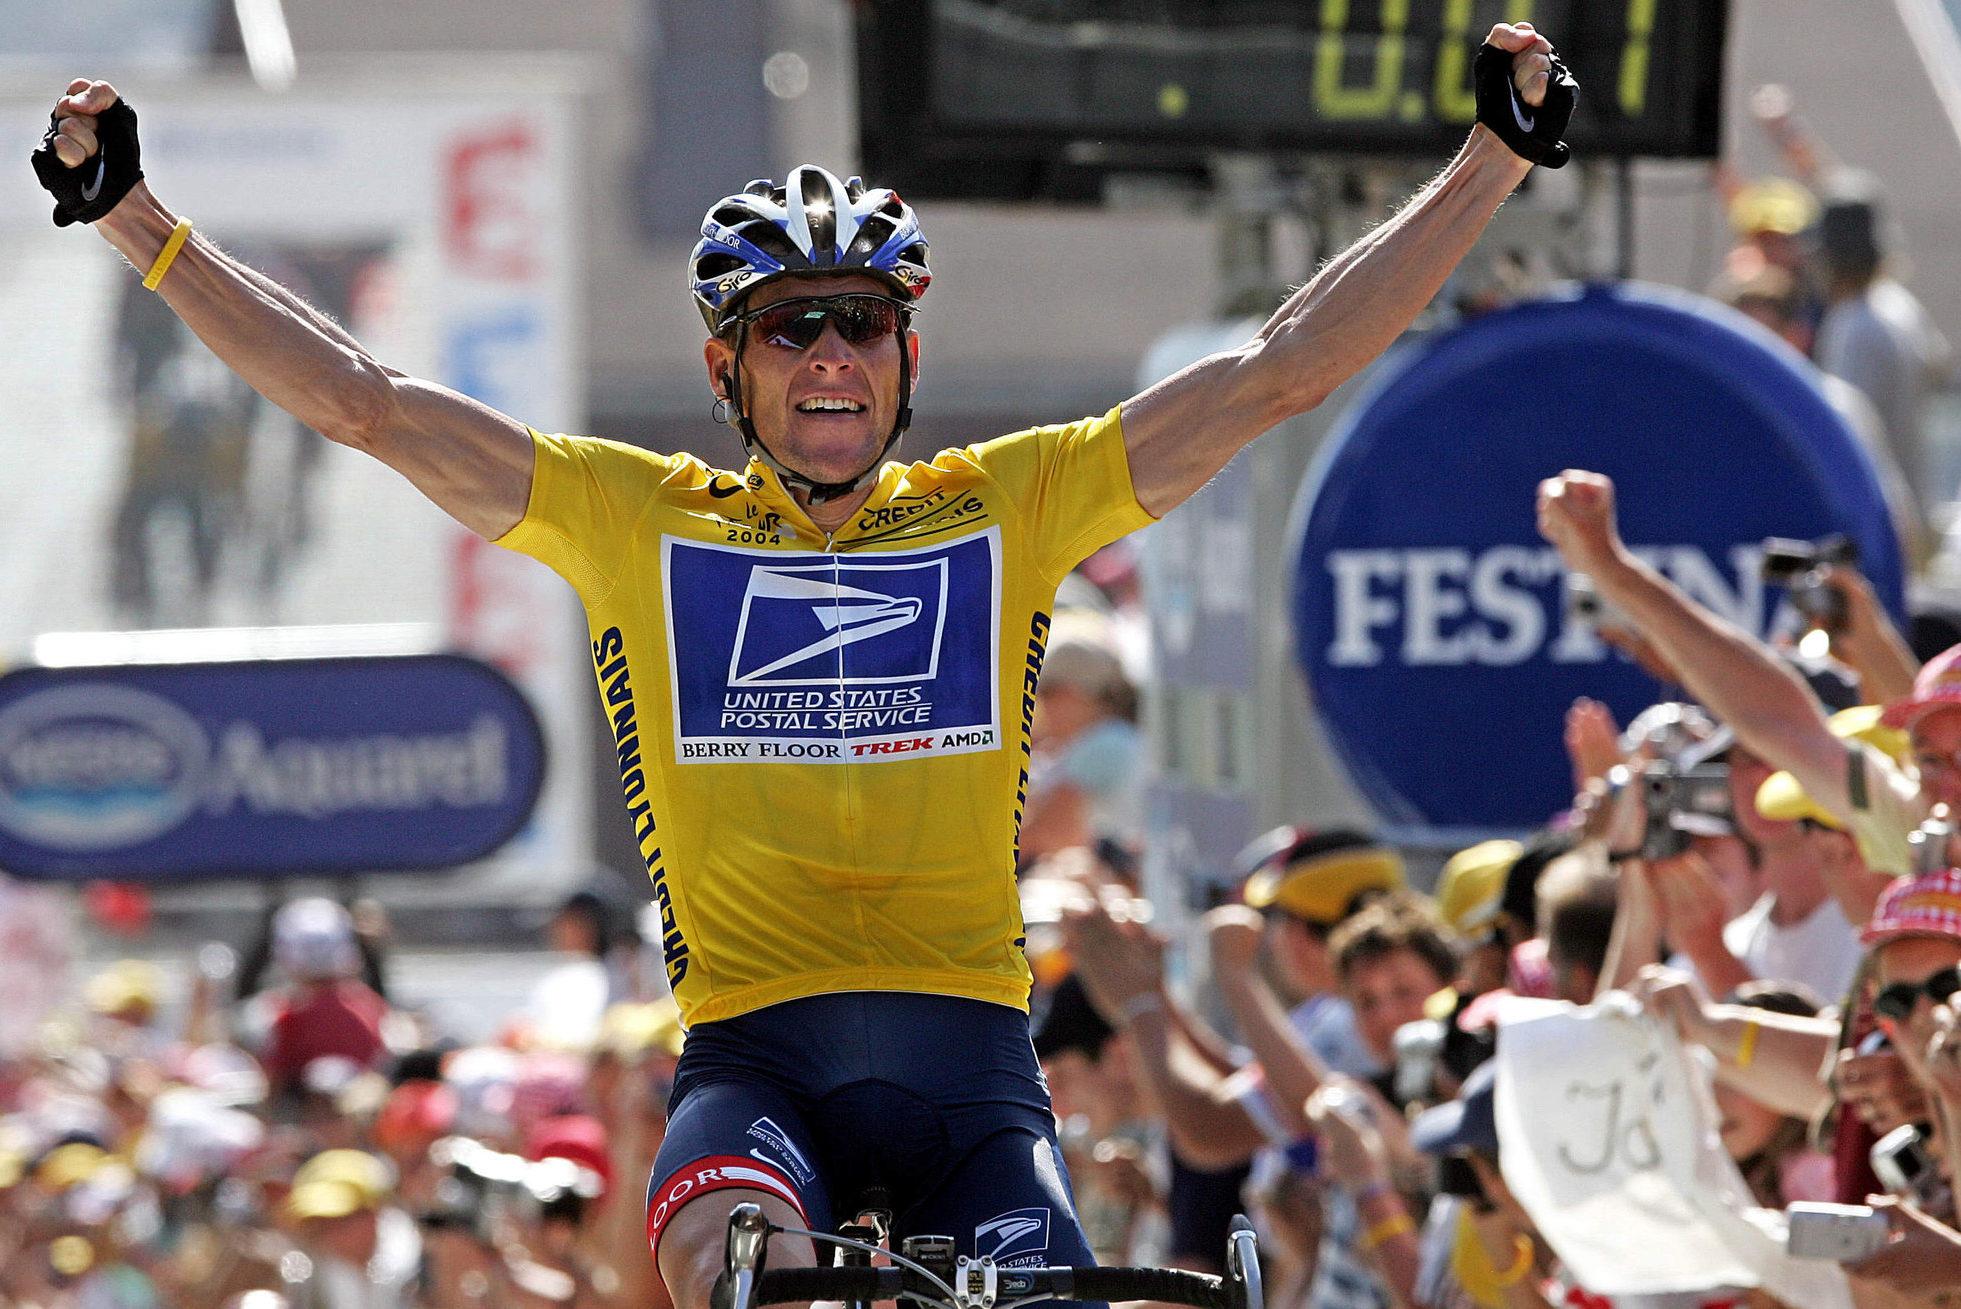 Lance Armstrong Tour de France winner